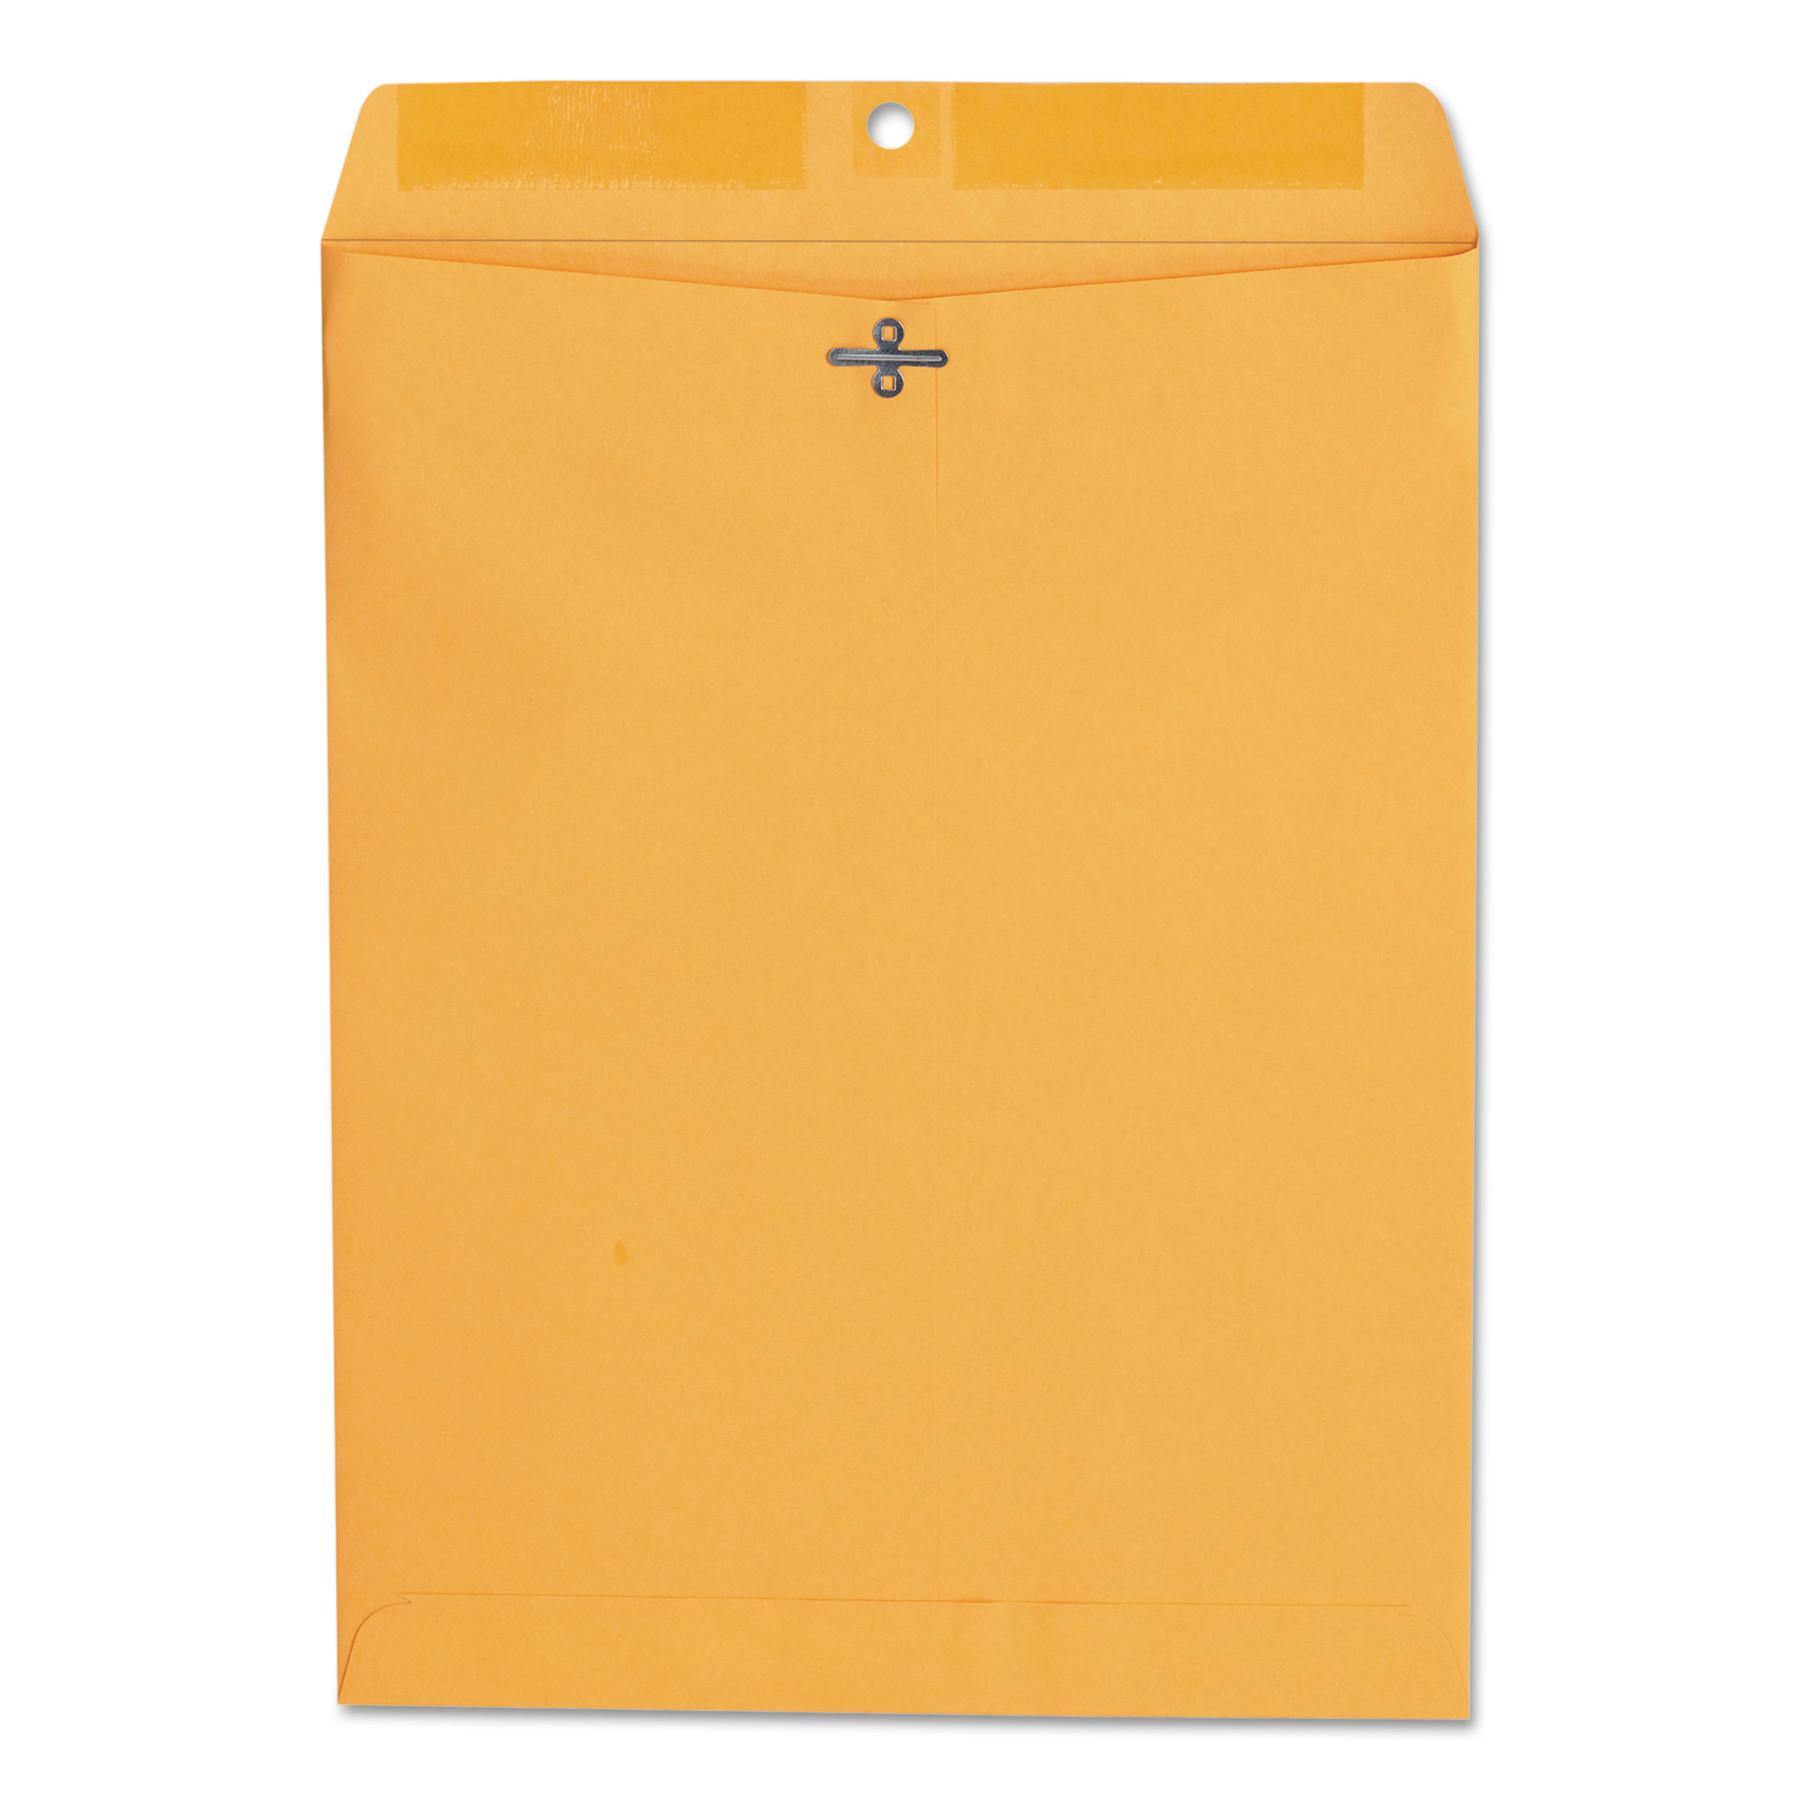 Kraft Clasp Envelope, Center Seam, 28lb, 10 x 13, Brown Kraft, 100/Box